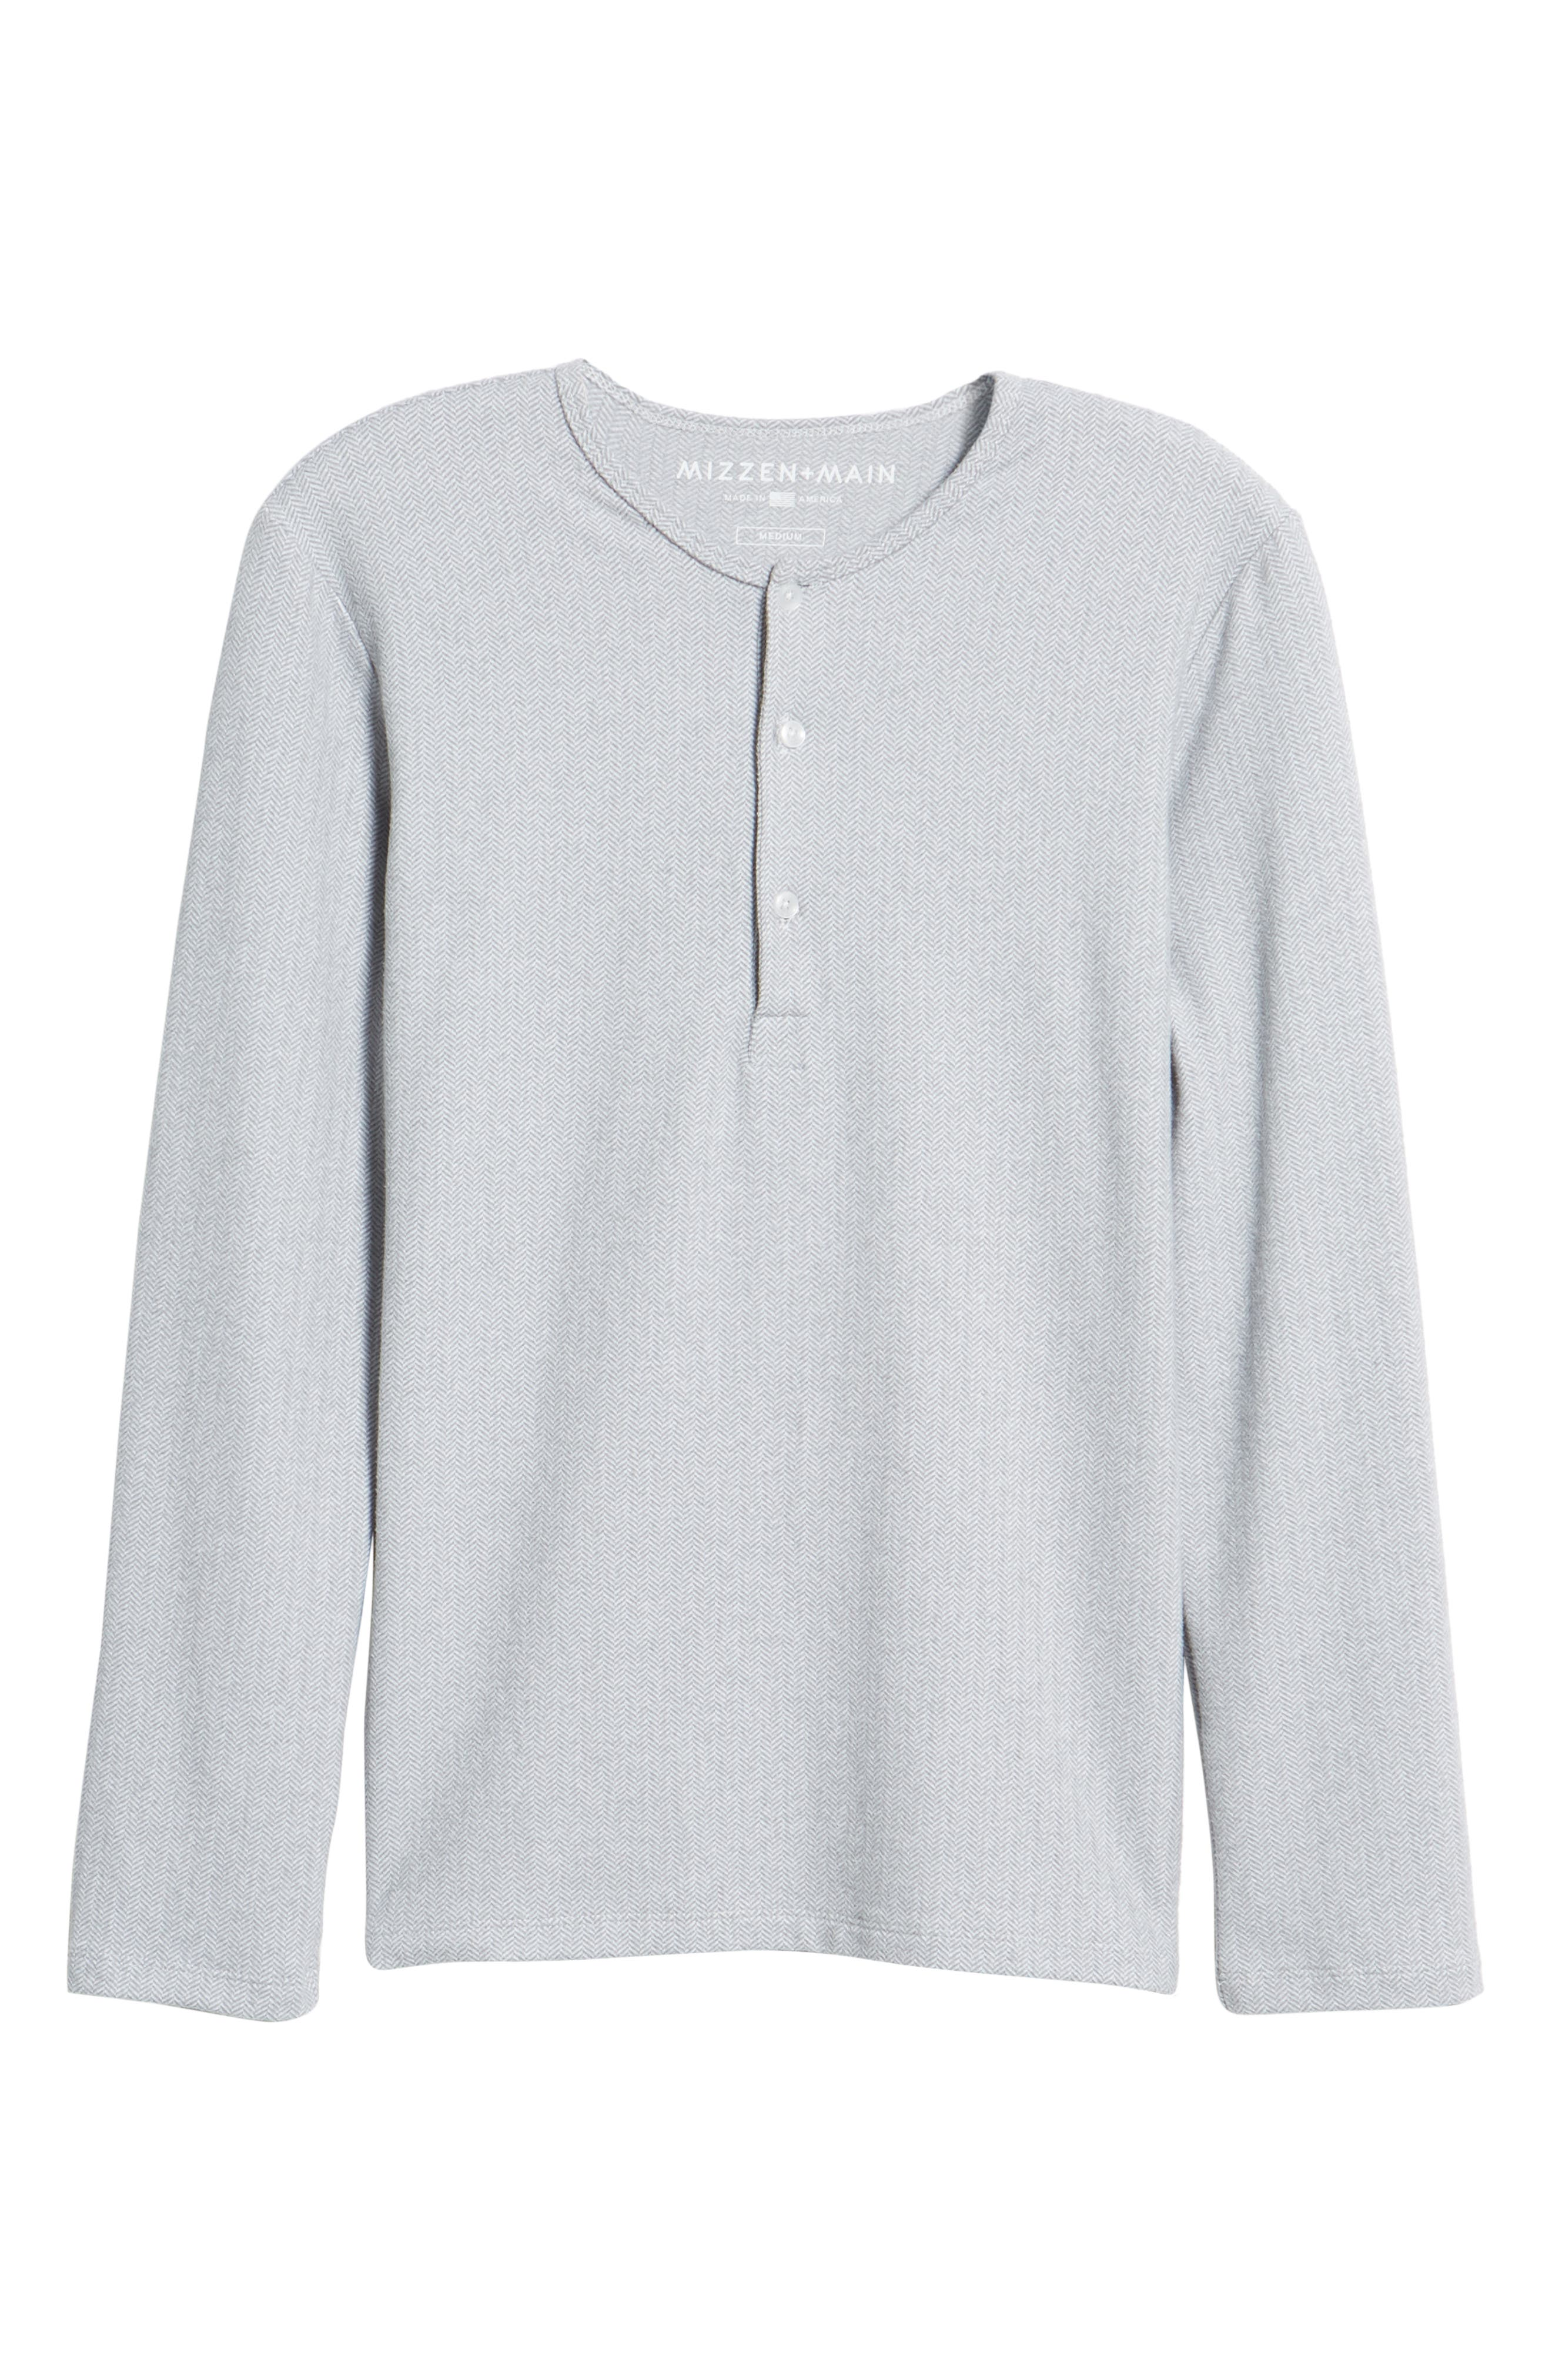 MIZZEN+MAIN,                             Anchorage Regular Fit Henley T-Shirt,                             Alternate thumbnail 6, color,                             031